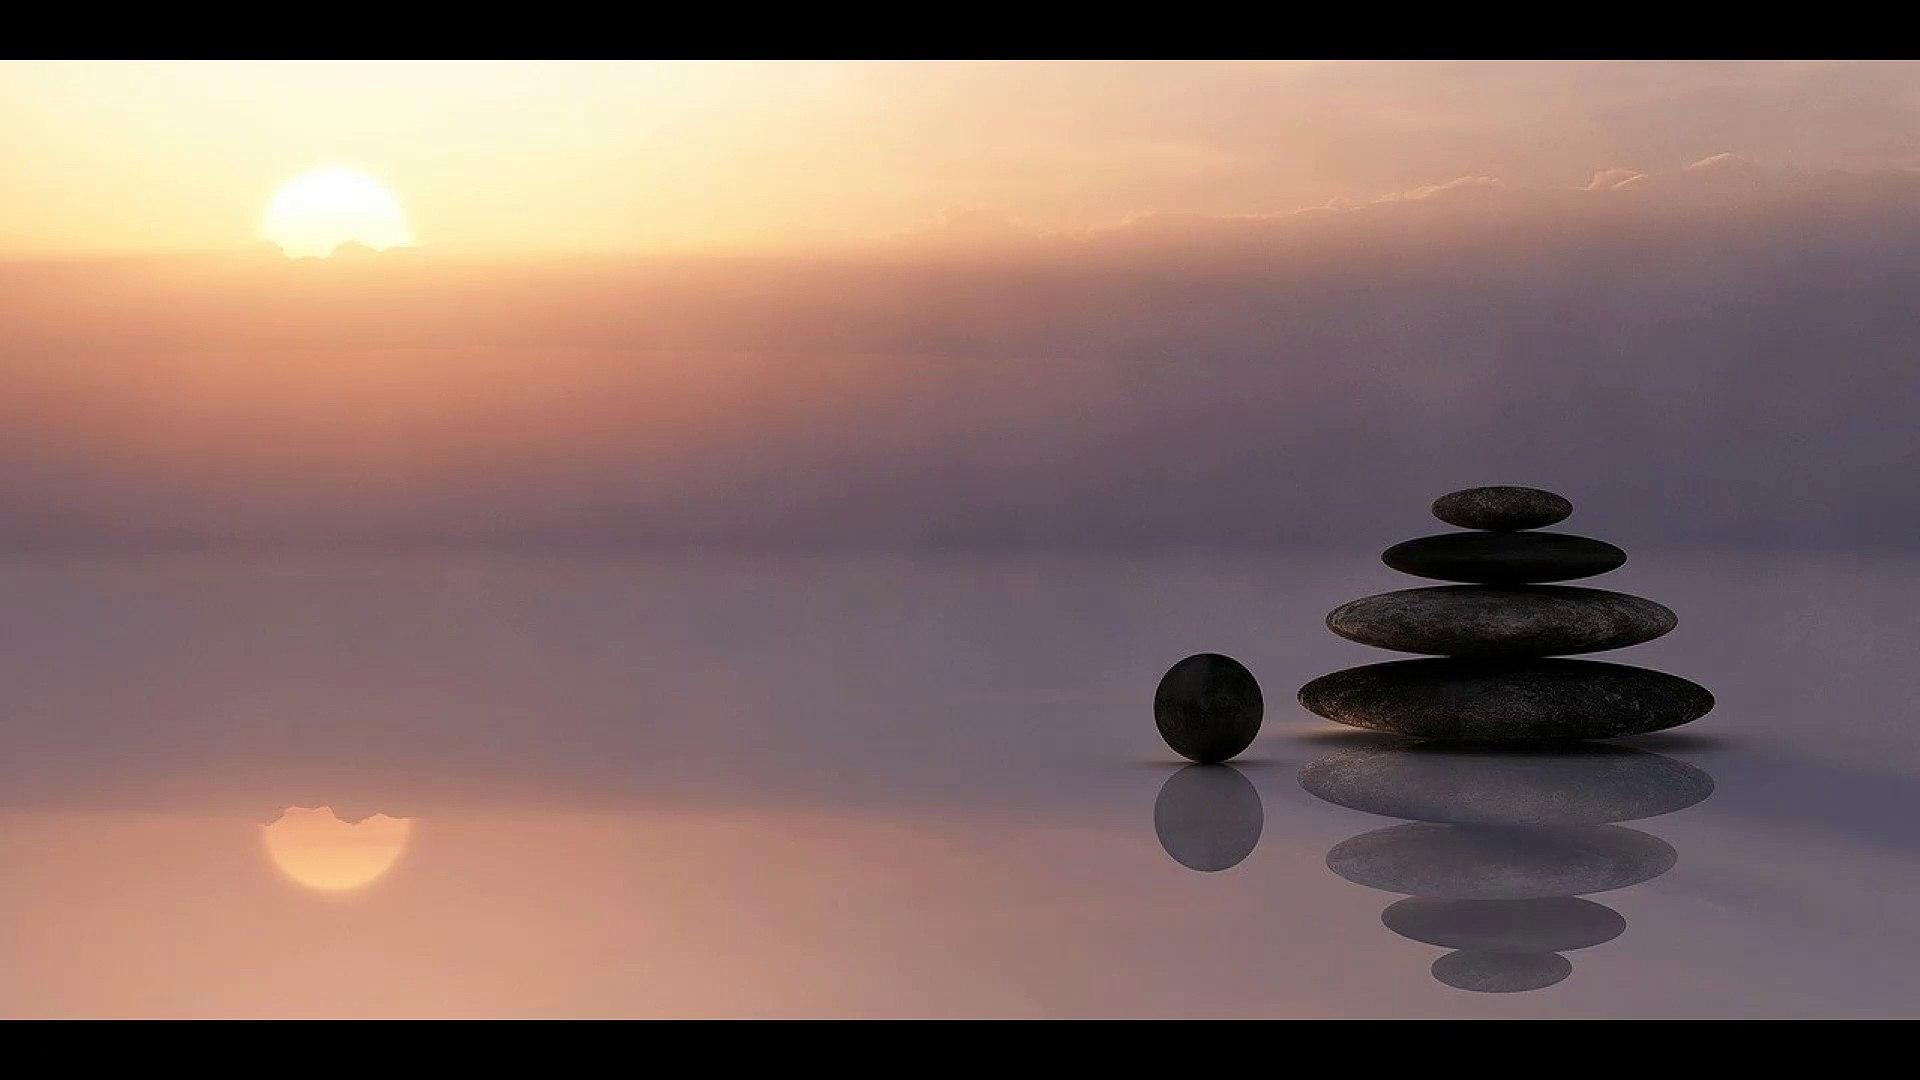 3.Meditation Music Relaxation Music